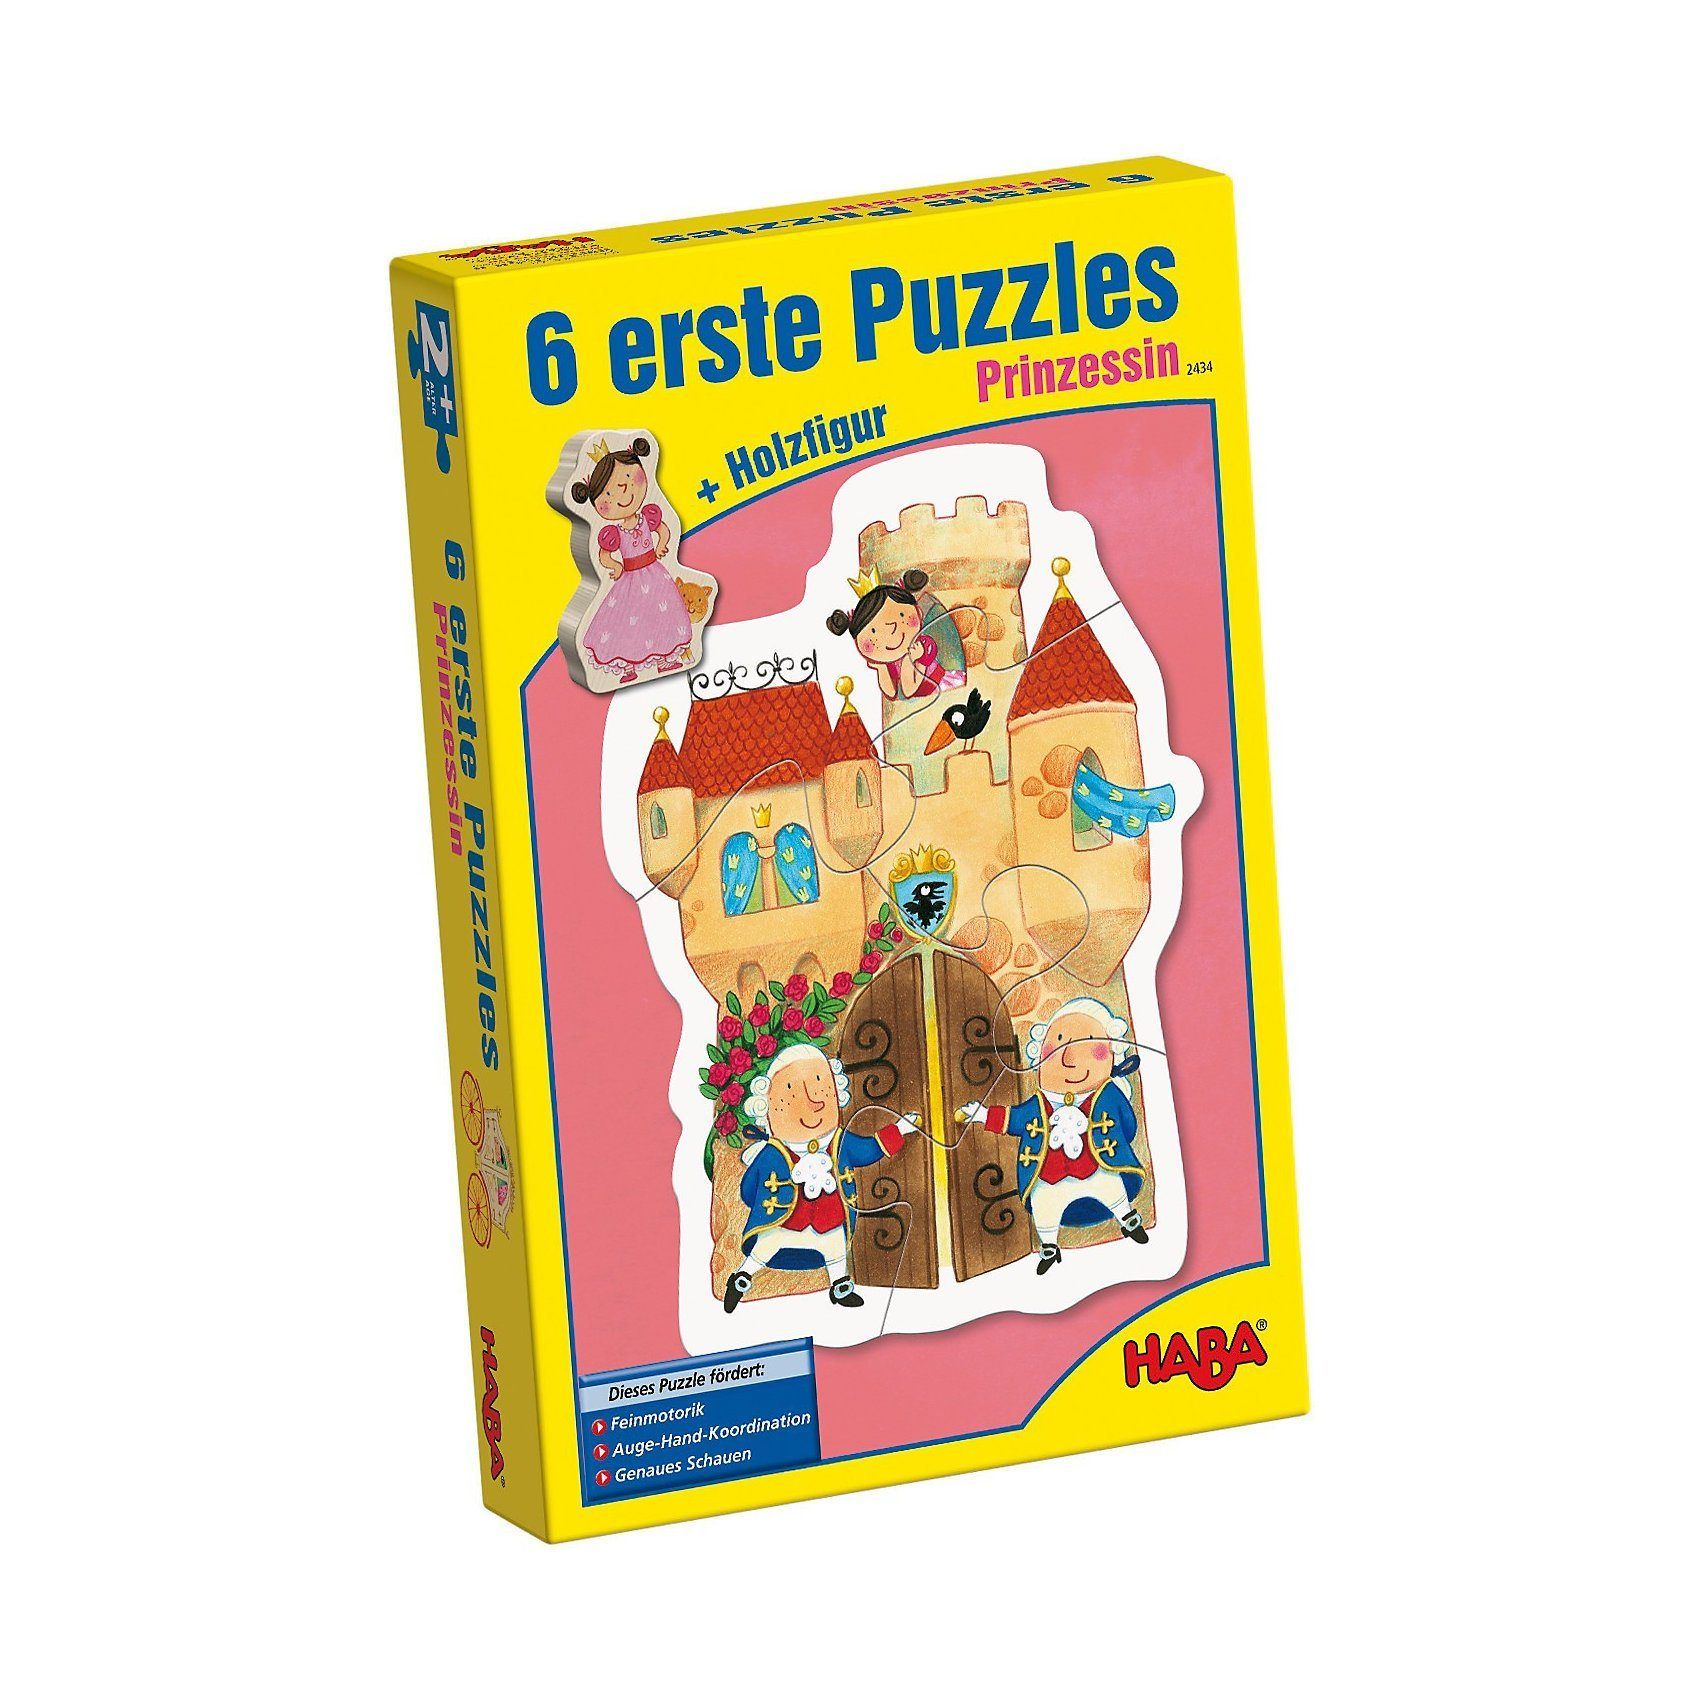 Haba 6 erste Puzzles - Prinzessin